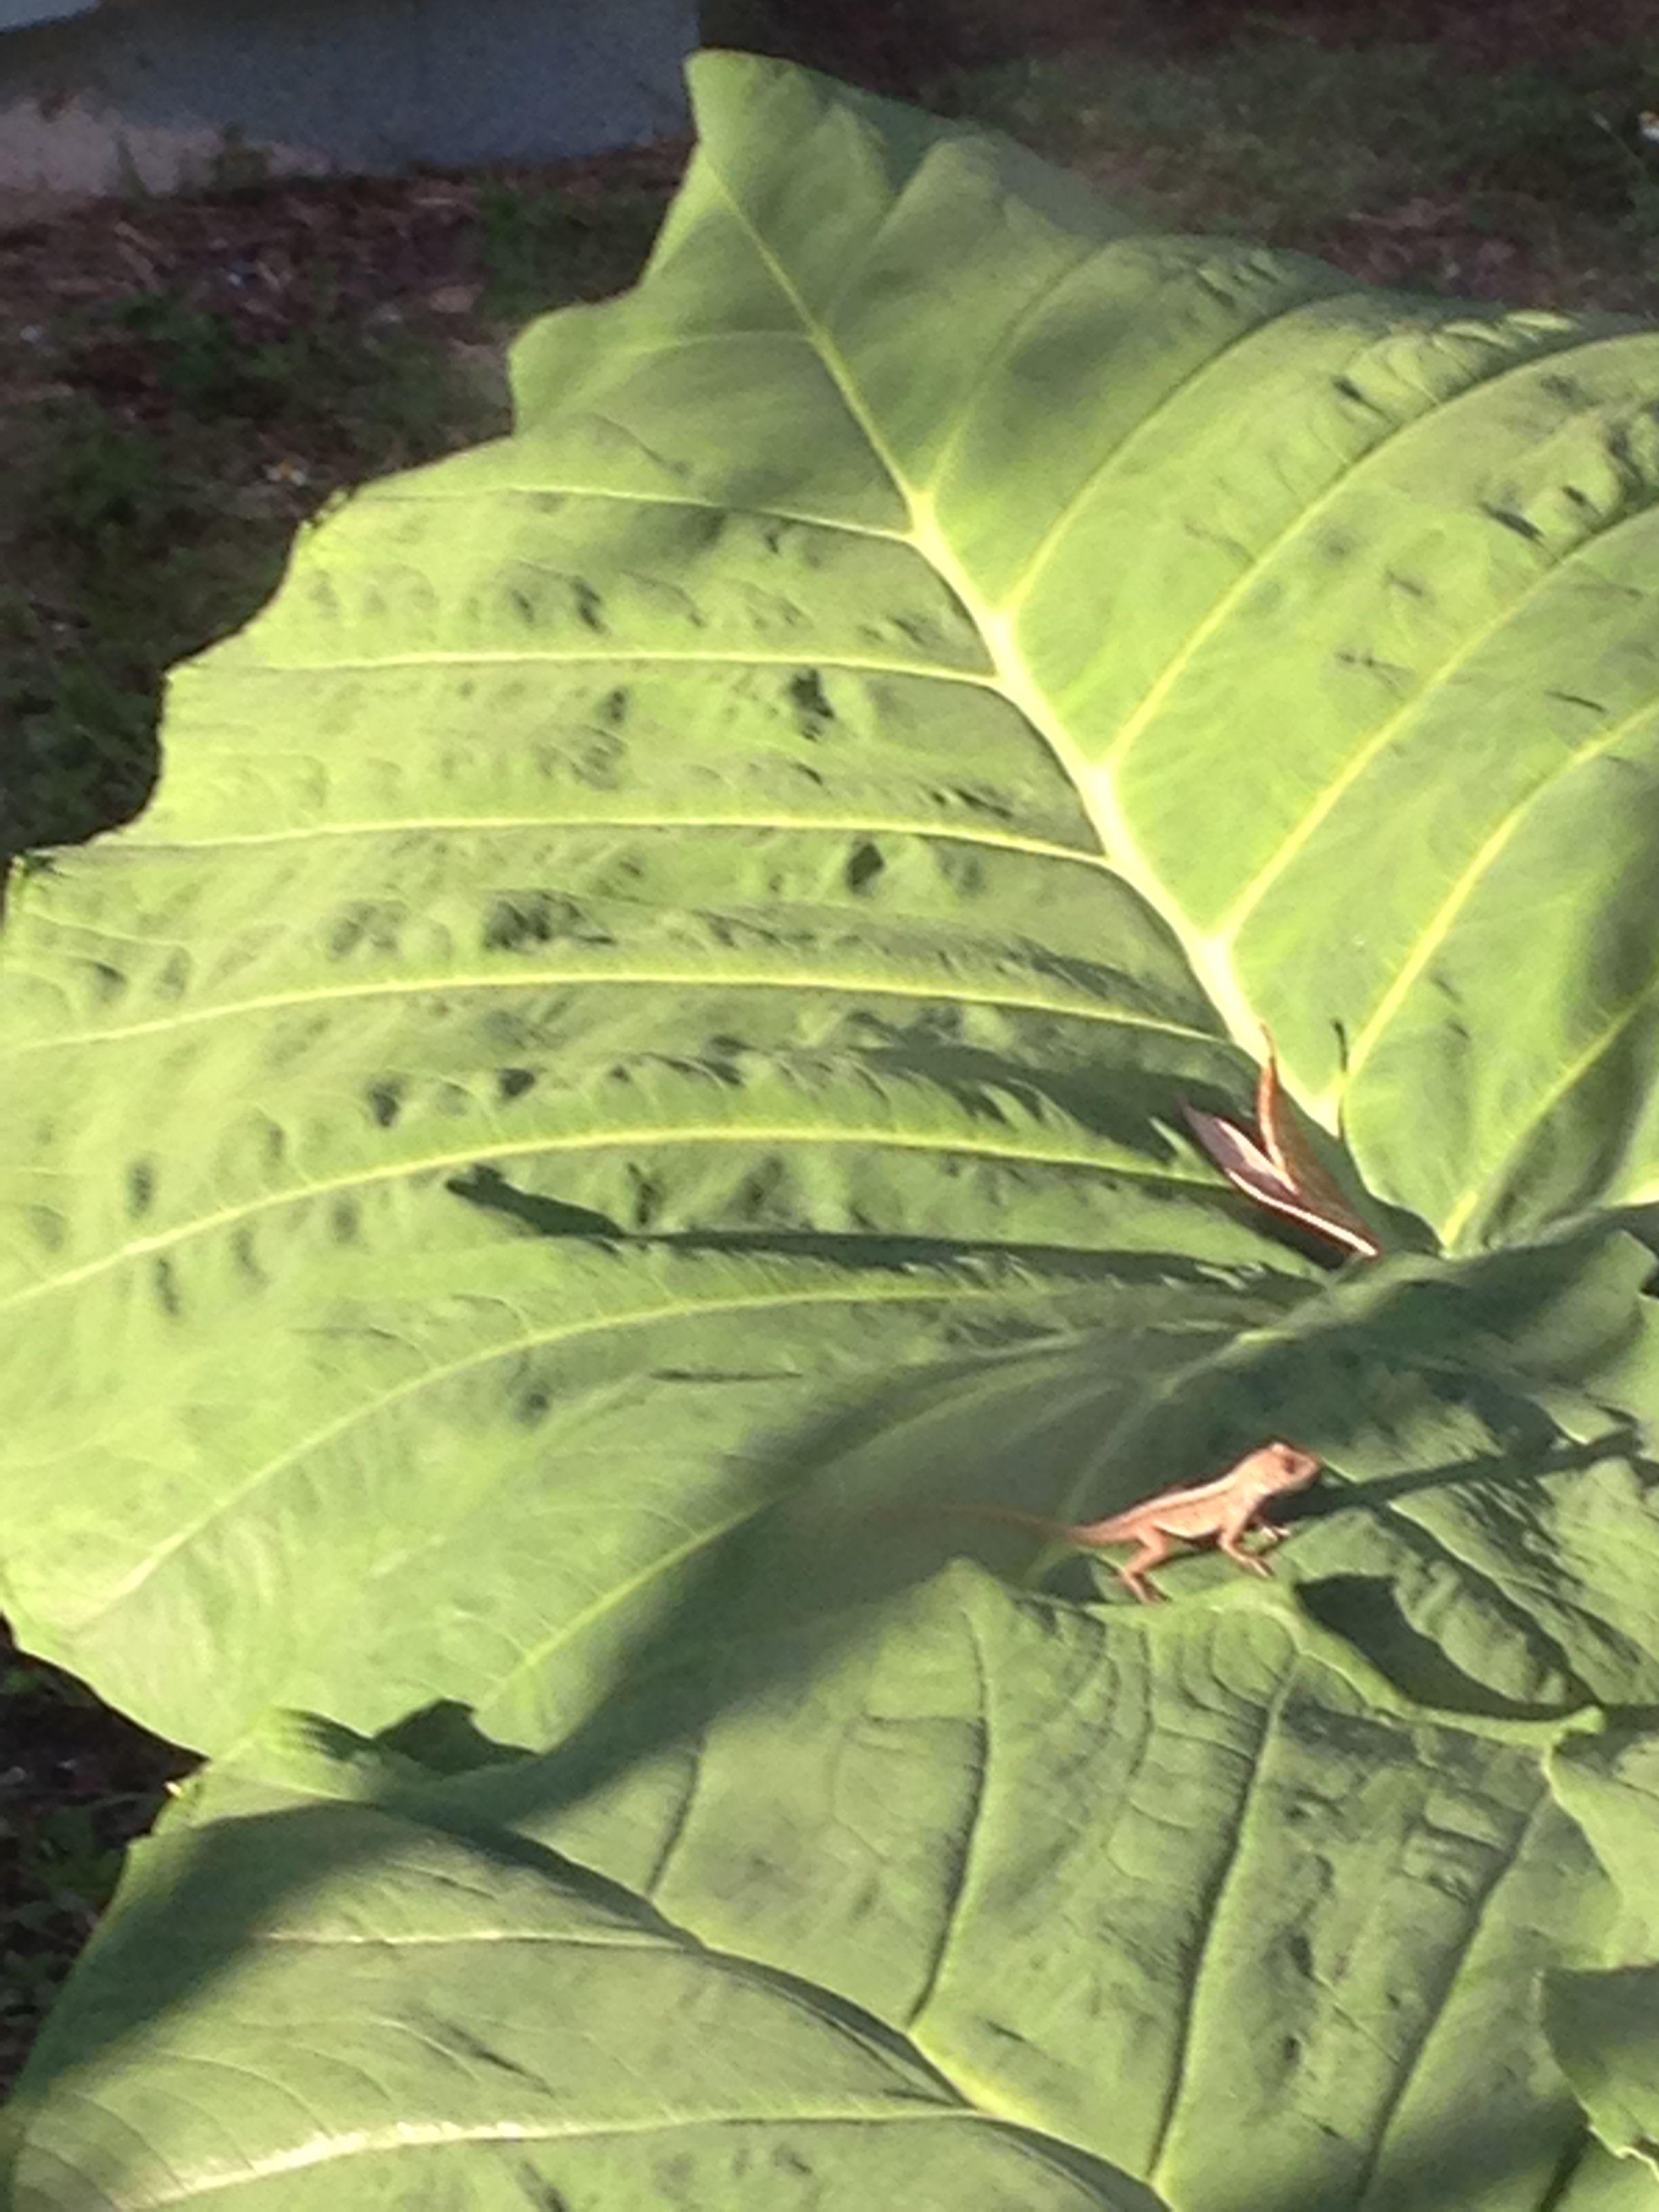 A small lizard on my Elephant Ear plant, My Secret Oais